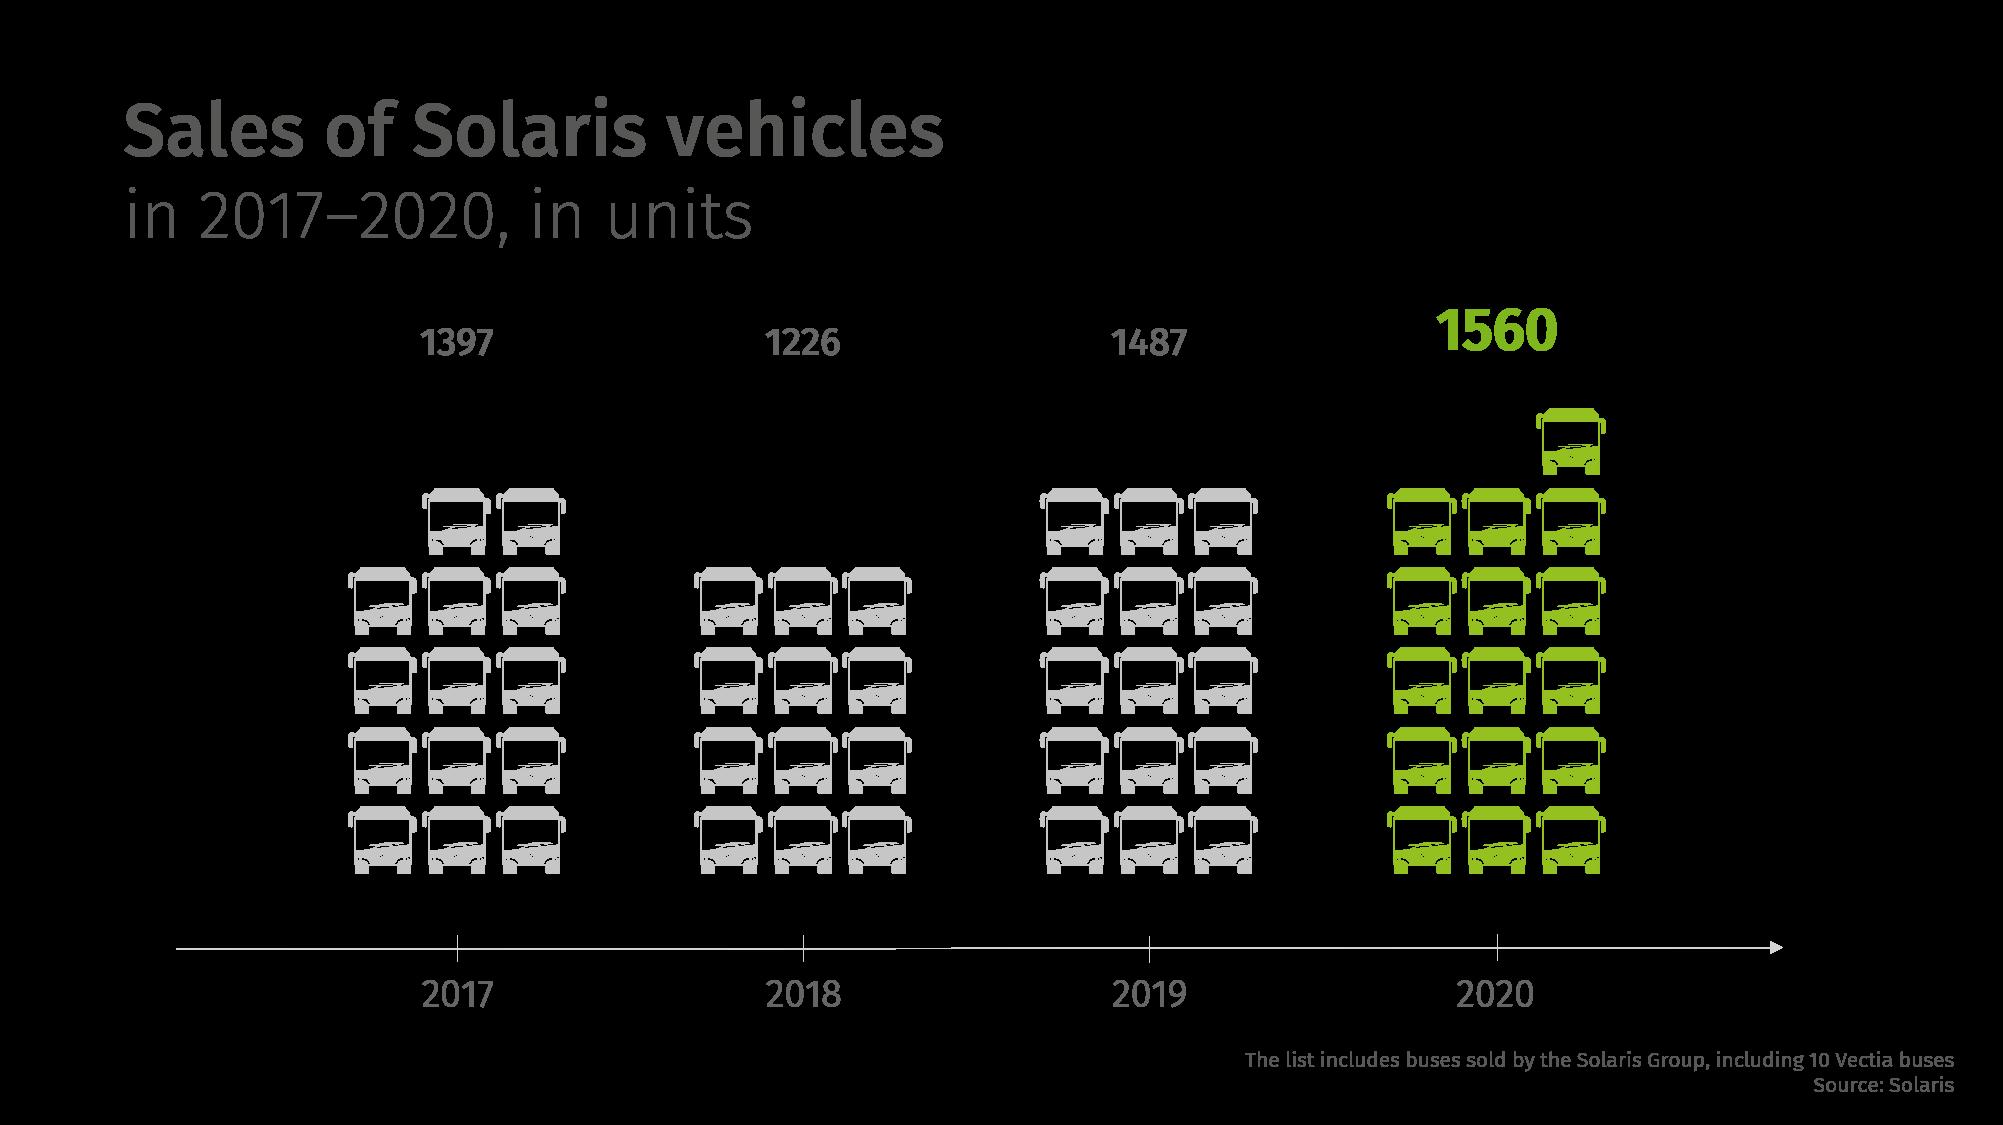 solaris results 2020